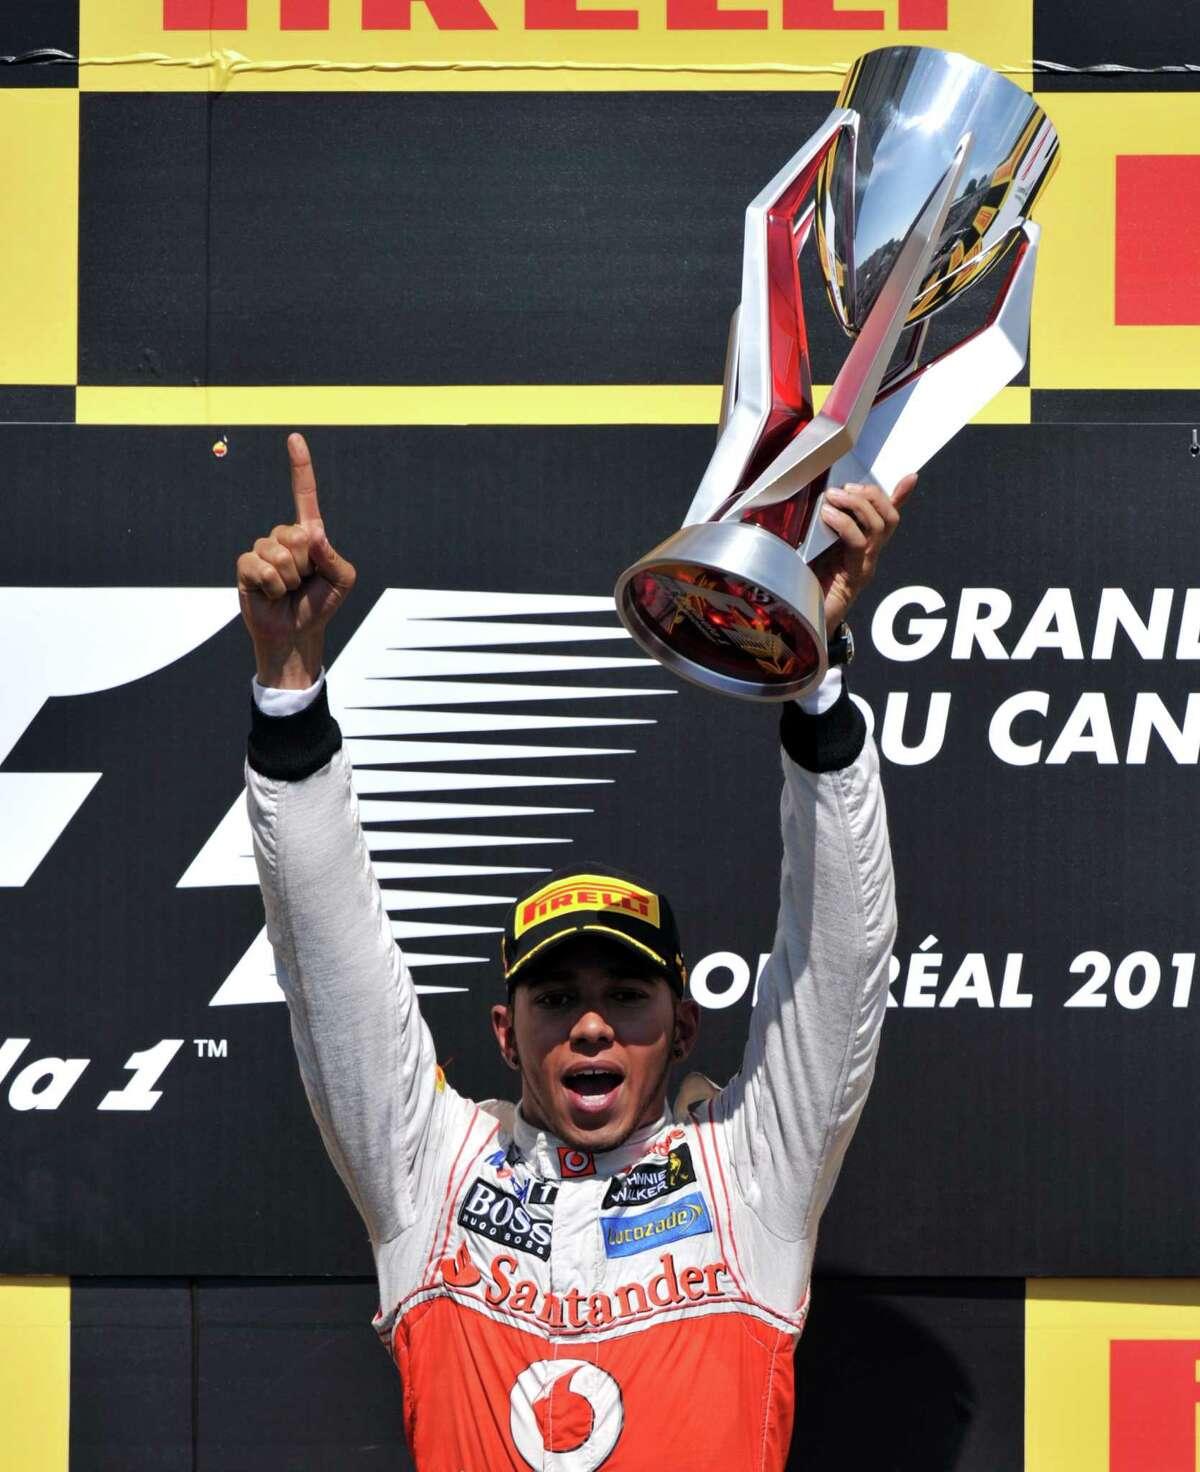 Tie - No. 24 Lewis Hamilton Sport: Auto racingTotal earnings: $28 million Salary/winnings: $25 million Endorsements: $3 million Photo: STAN HONDA, AFP/Getty Images / AFP ImageForum